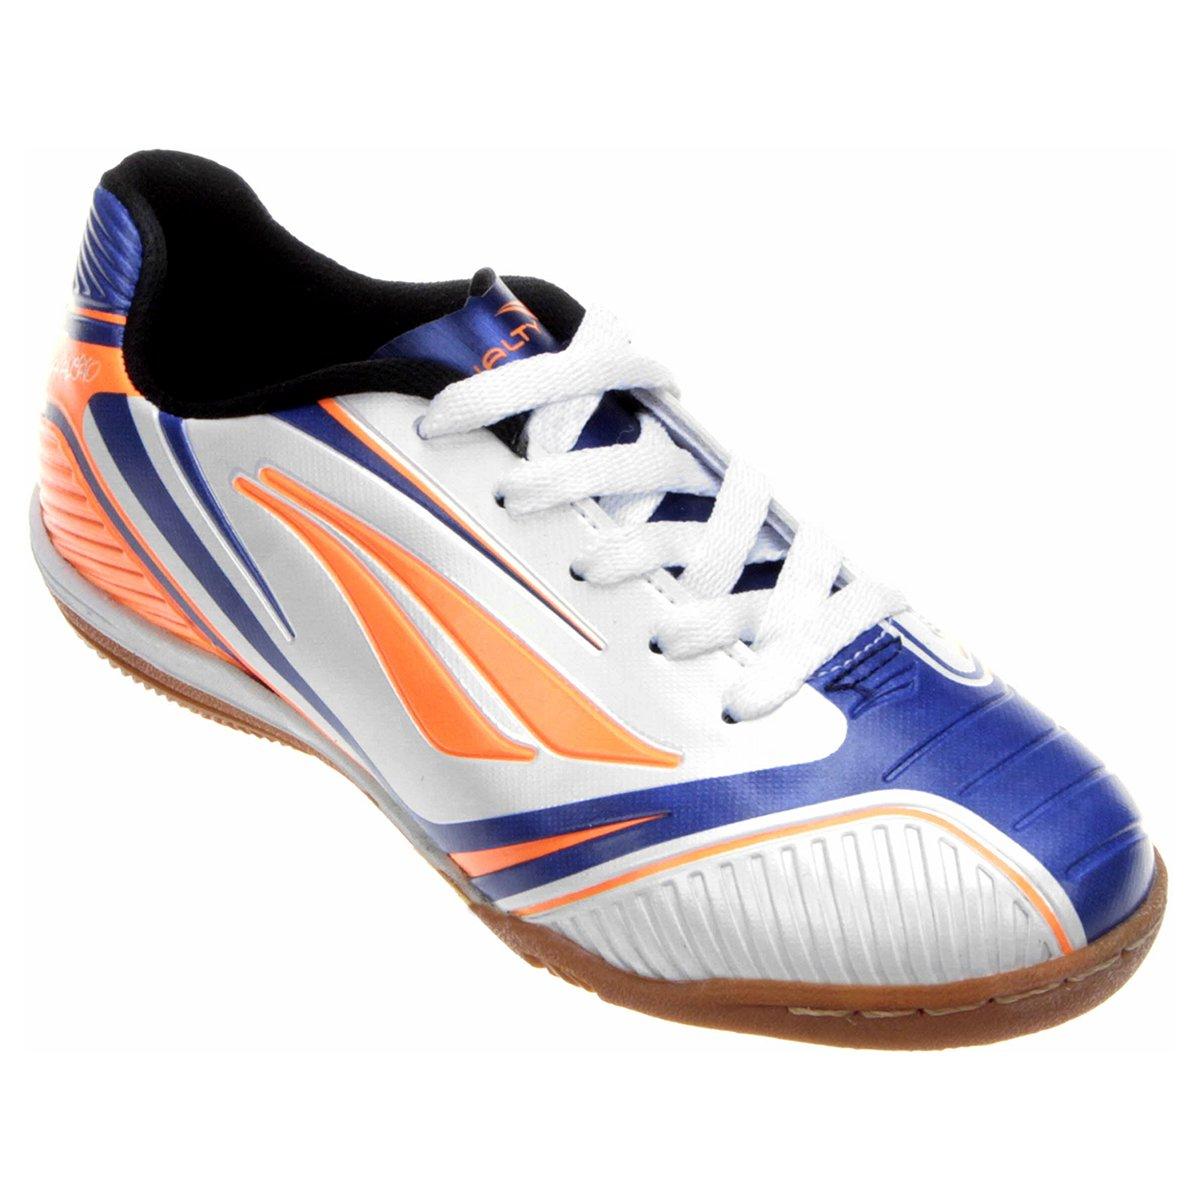 952c23e4fd Chuteira Penalty K Soccer Camaleão 5 Futsal Infantil